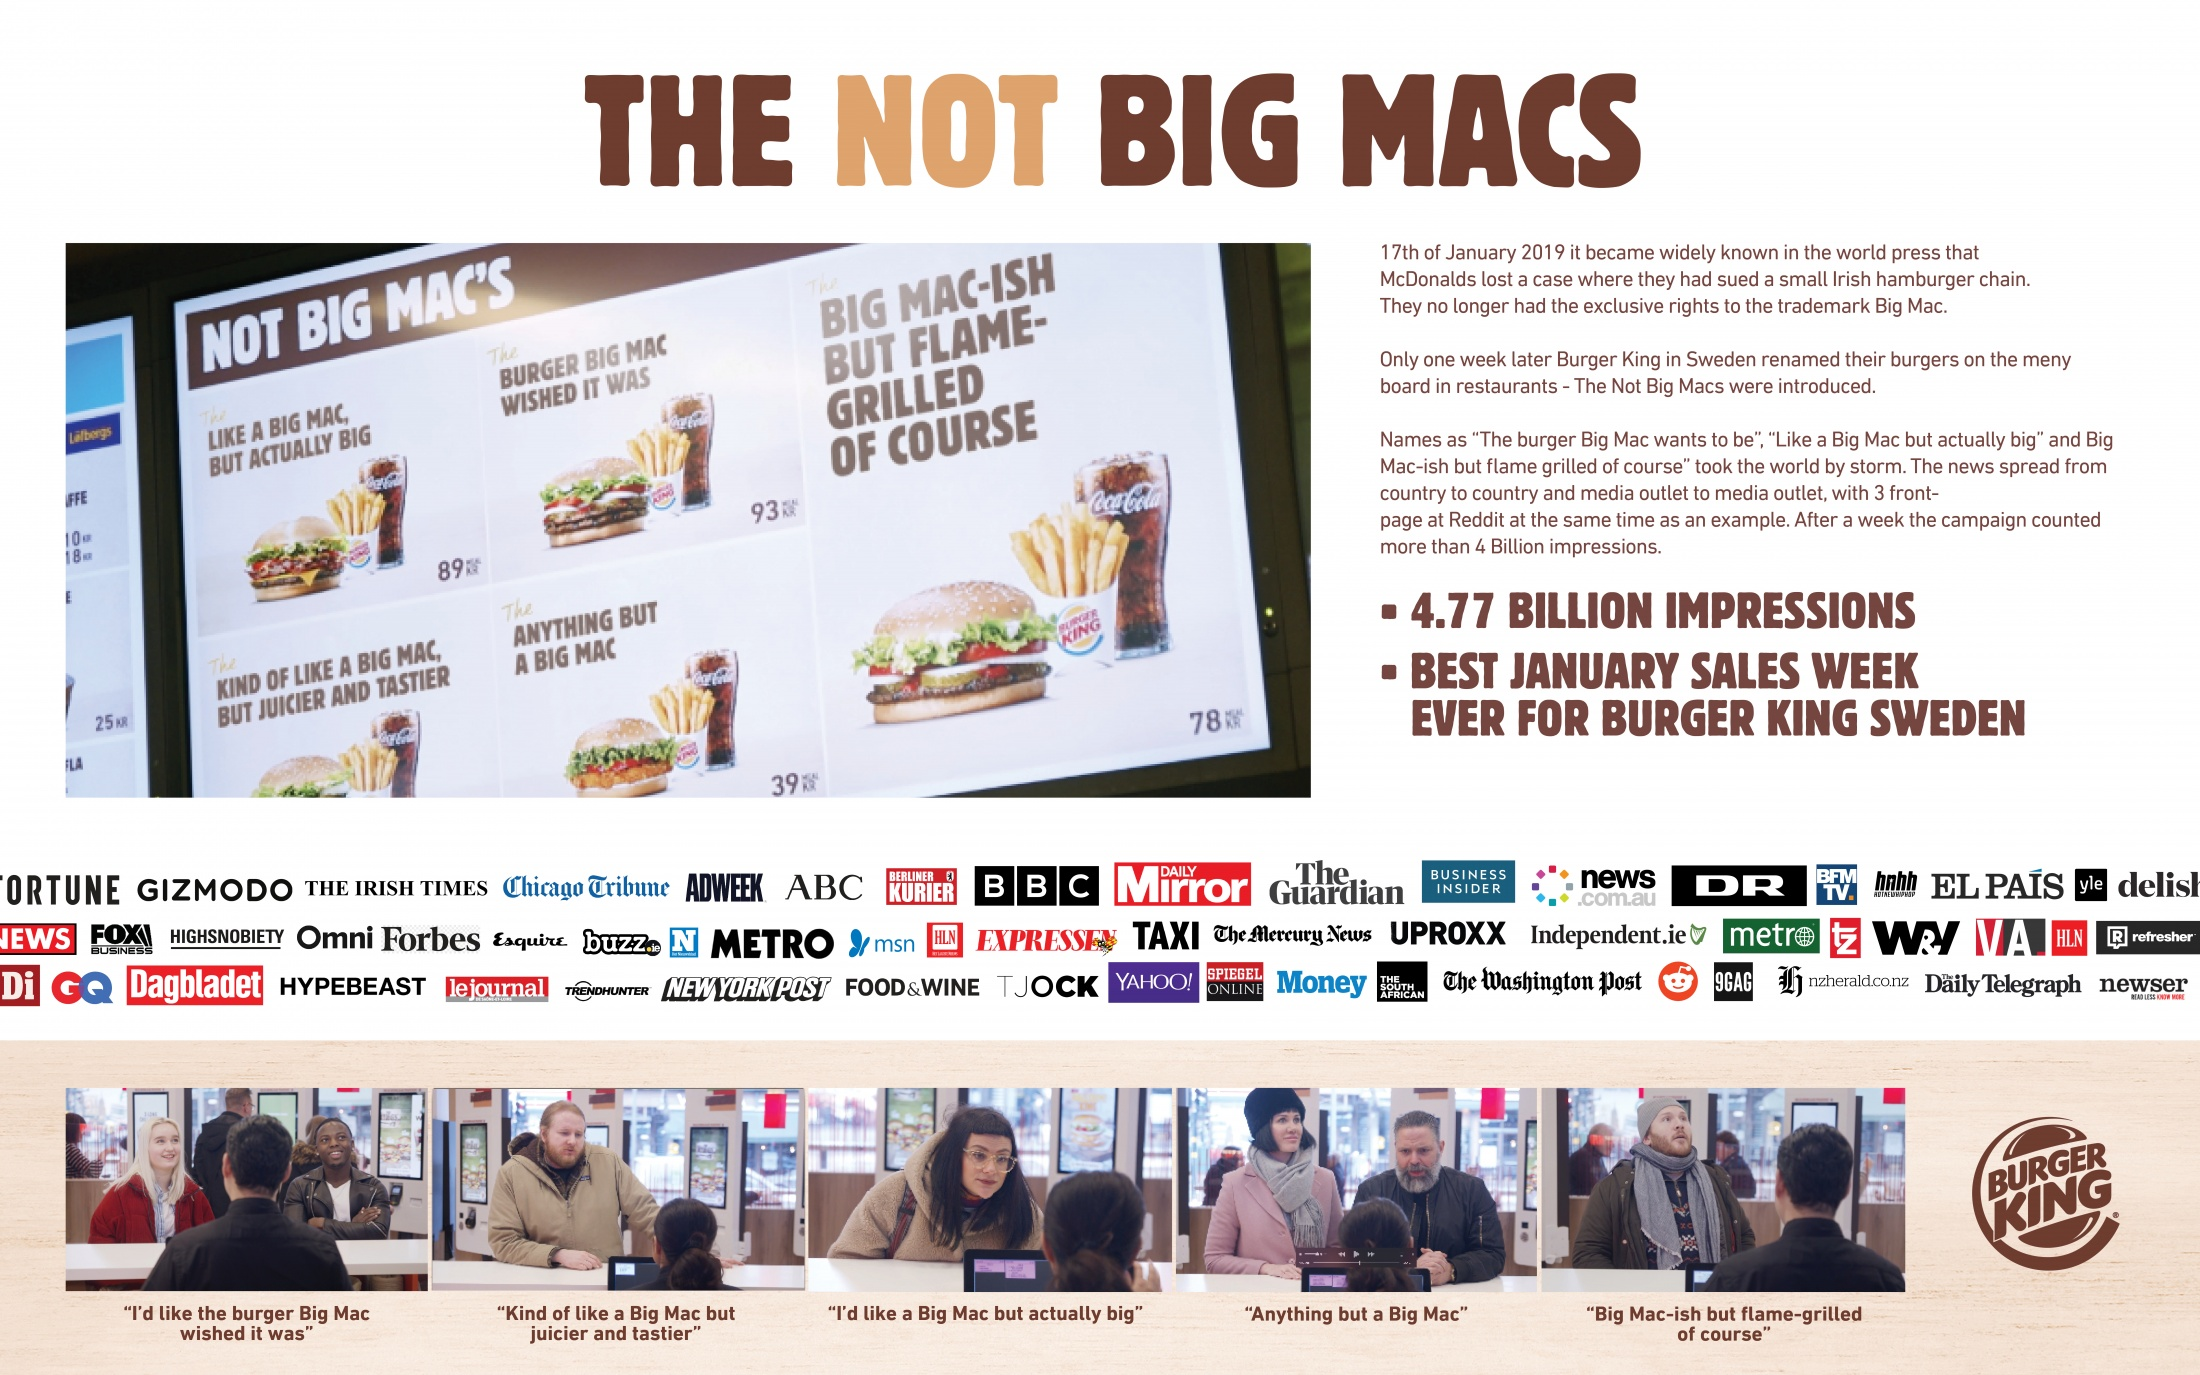 Thumbnail for The Not Big Macs